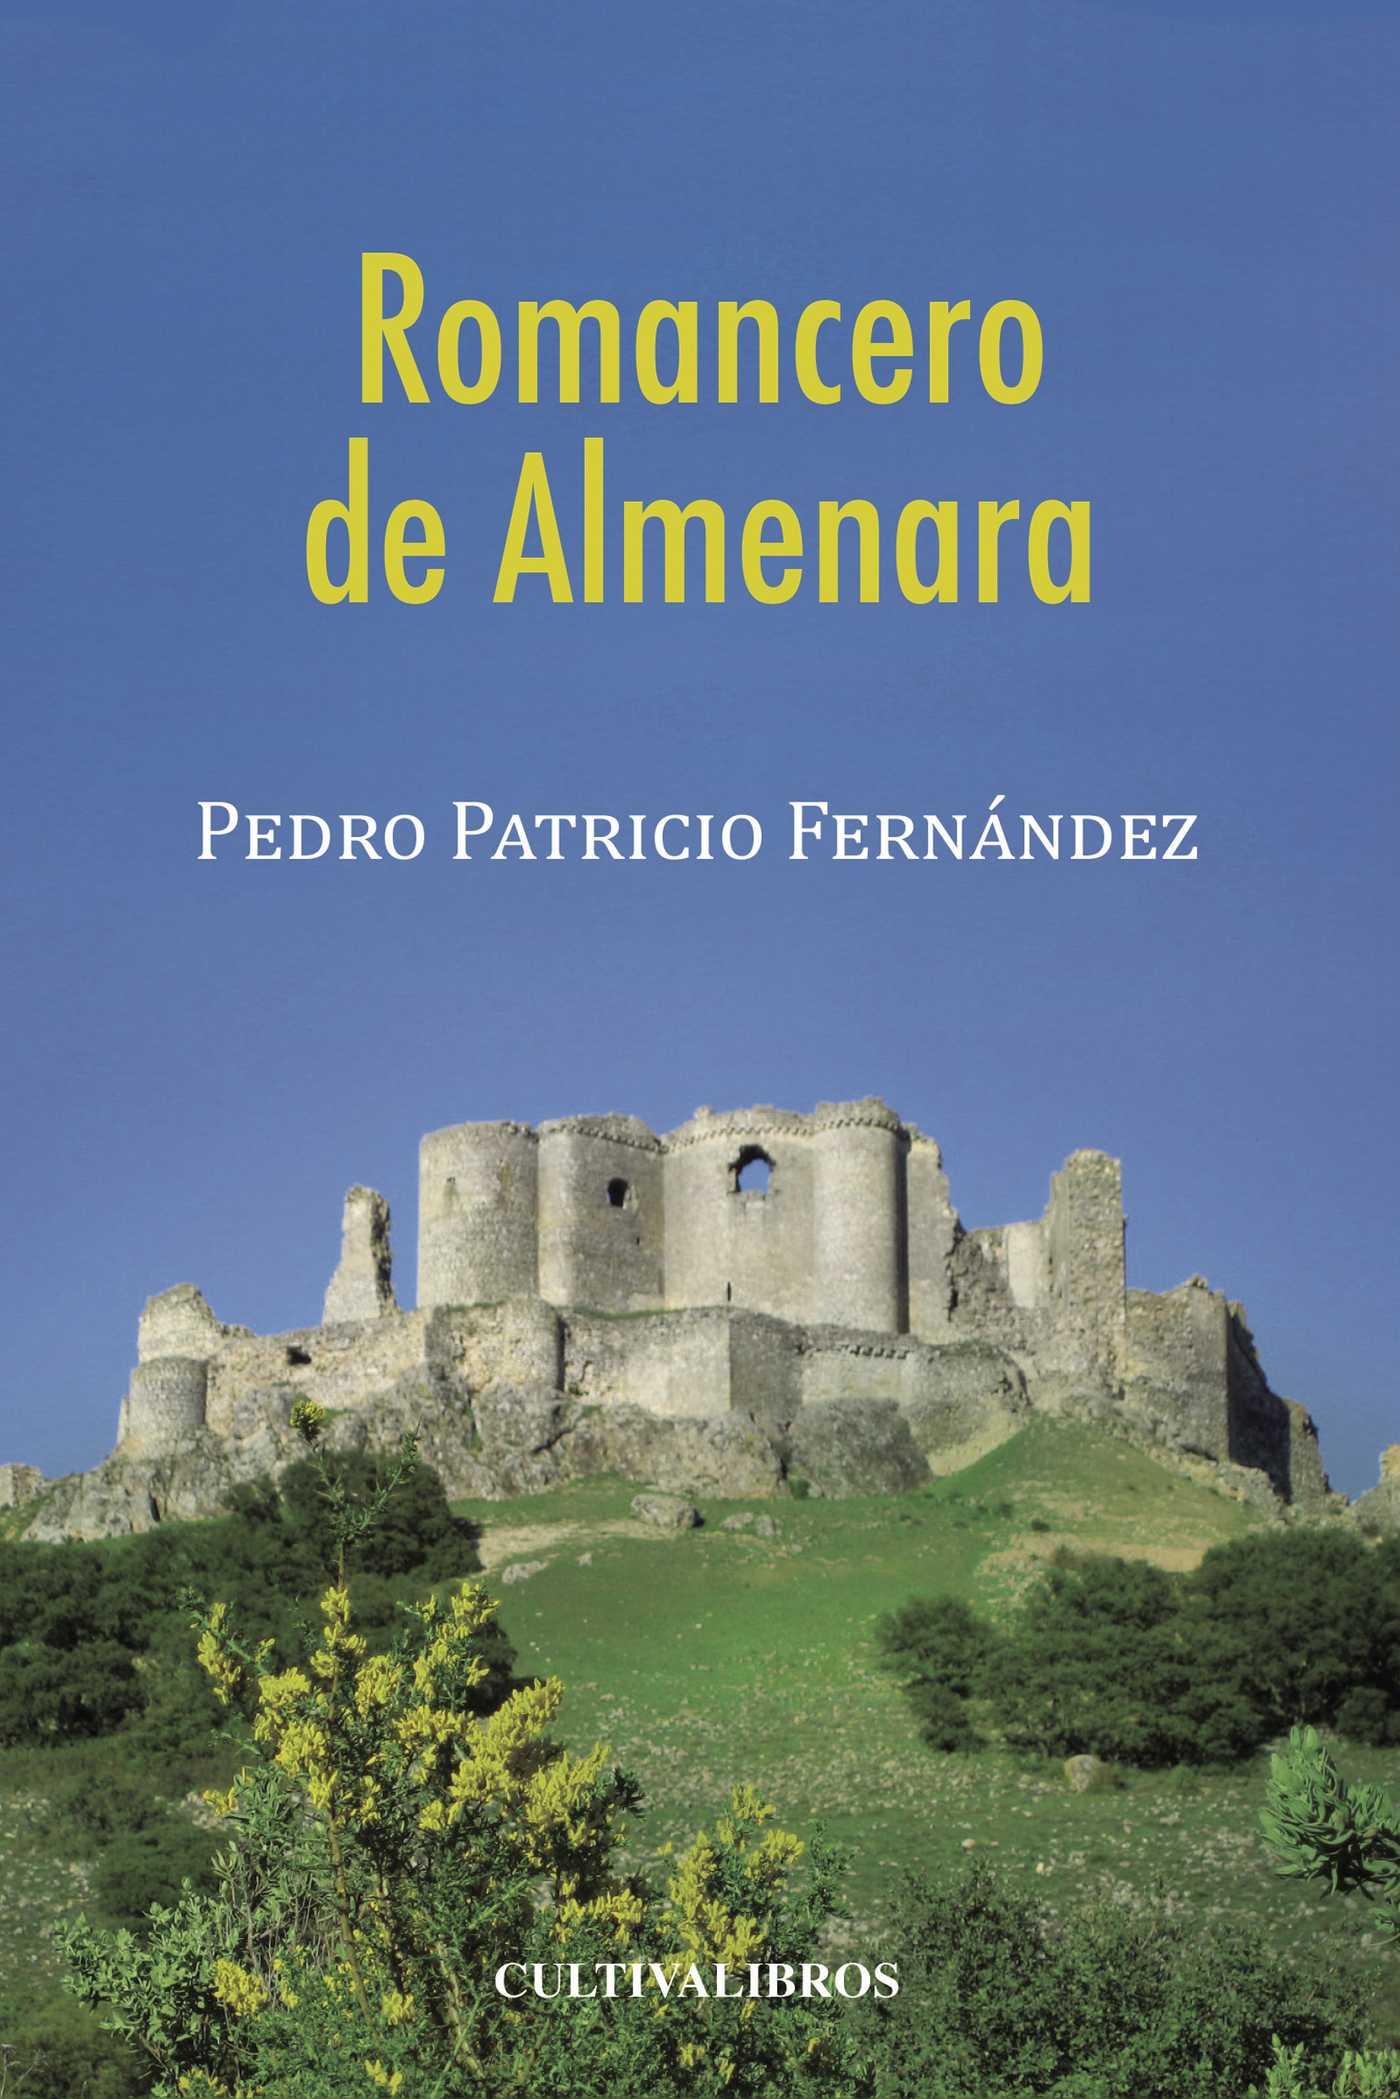 Descargar ROMANCERO DE ALMENARA